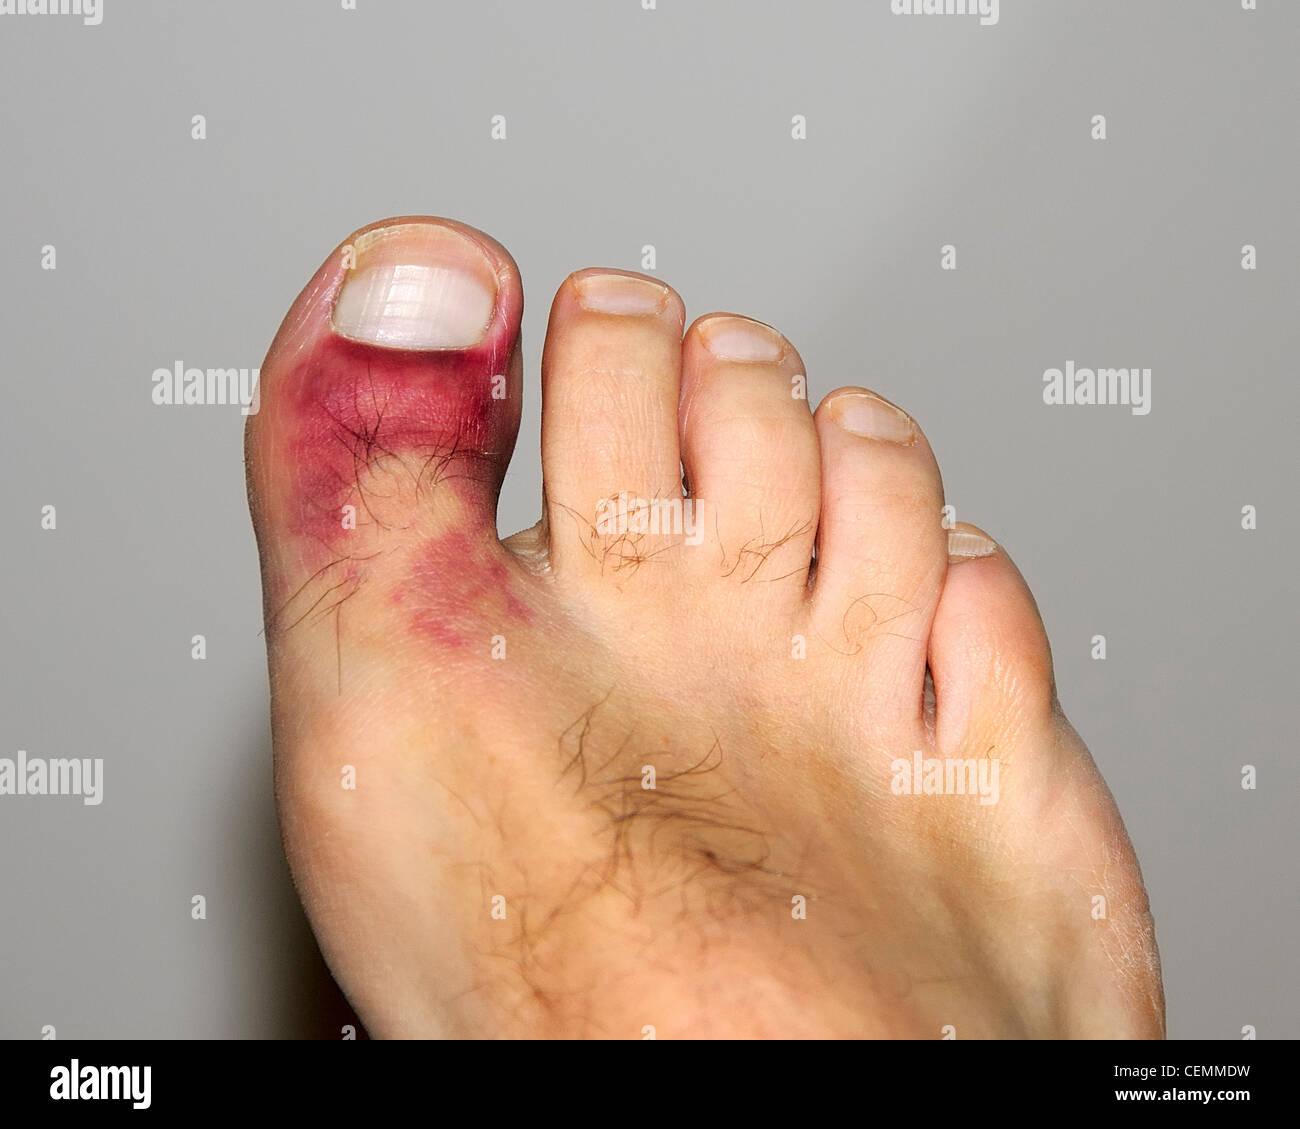 Bruised Toe Stock Photos & Bruised Toe Stock Images - Alamy